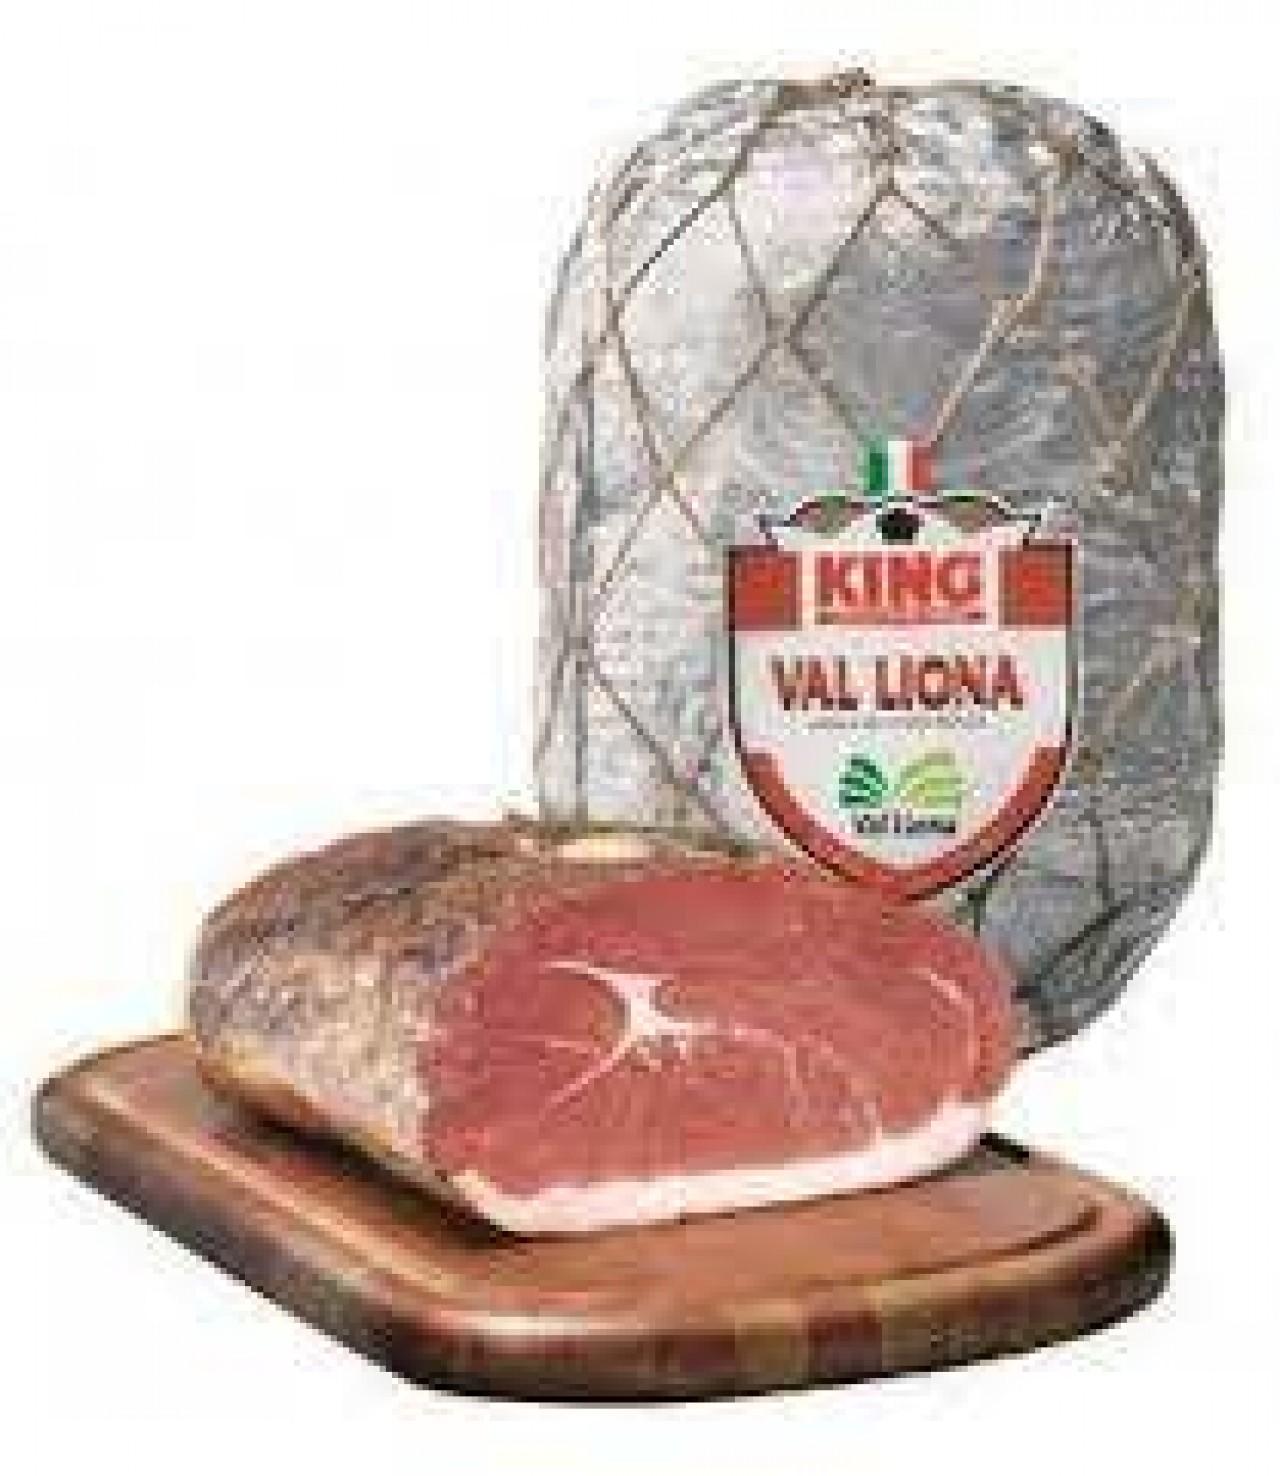 PROSCIUTTO CRUDO VAL LIONA KING'S